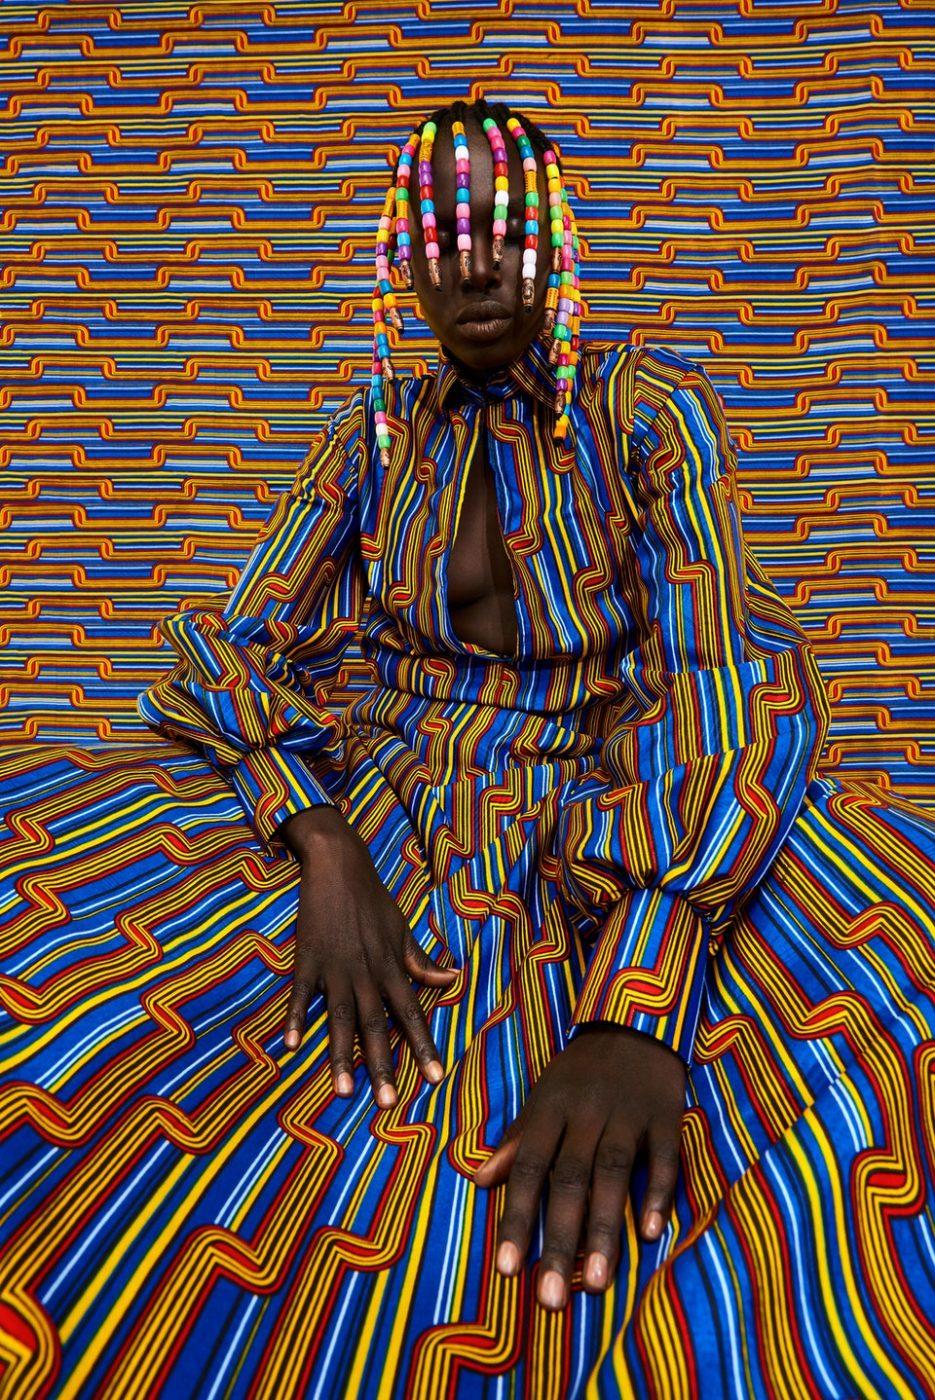 © Thandiwe Muriu, Female in Focus 2021 Single Image Winner